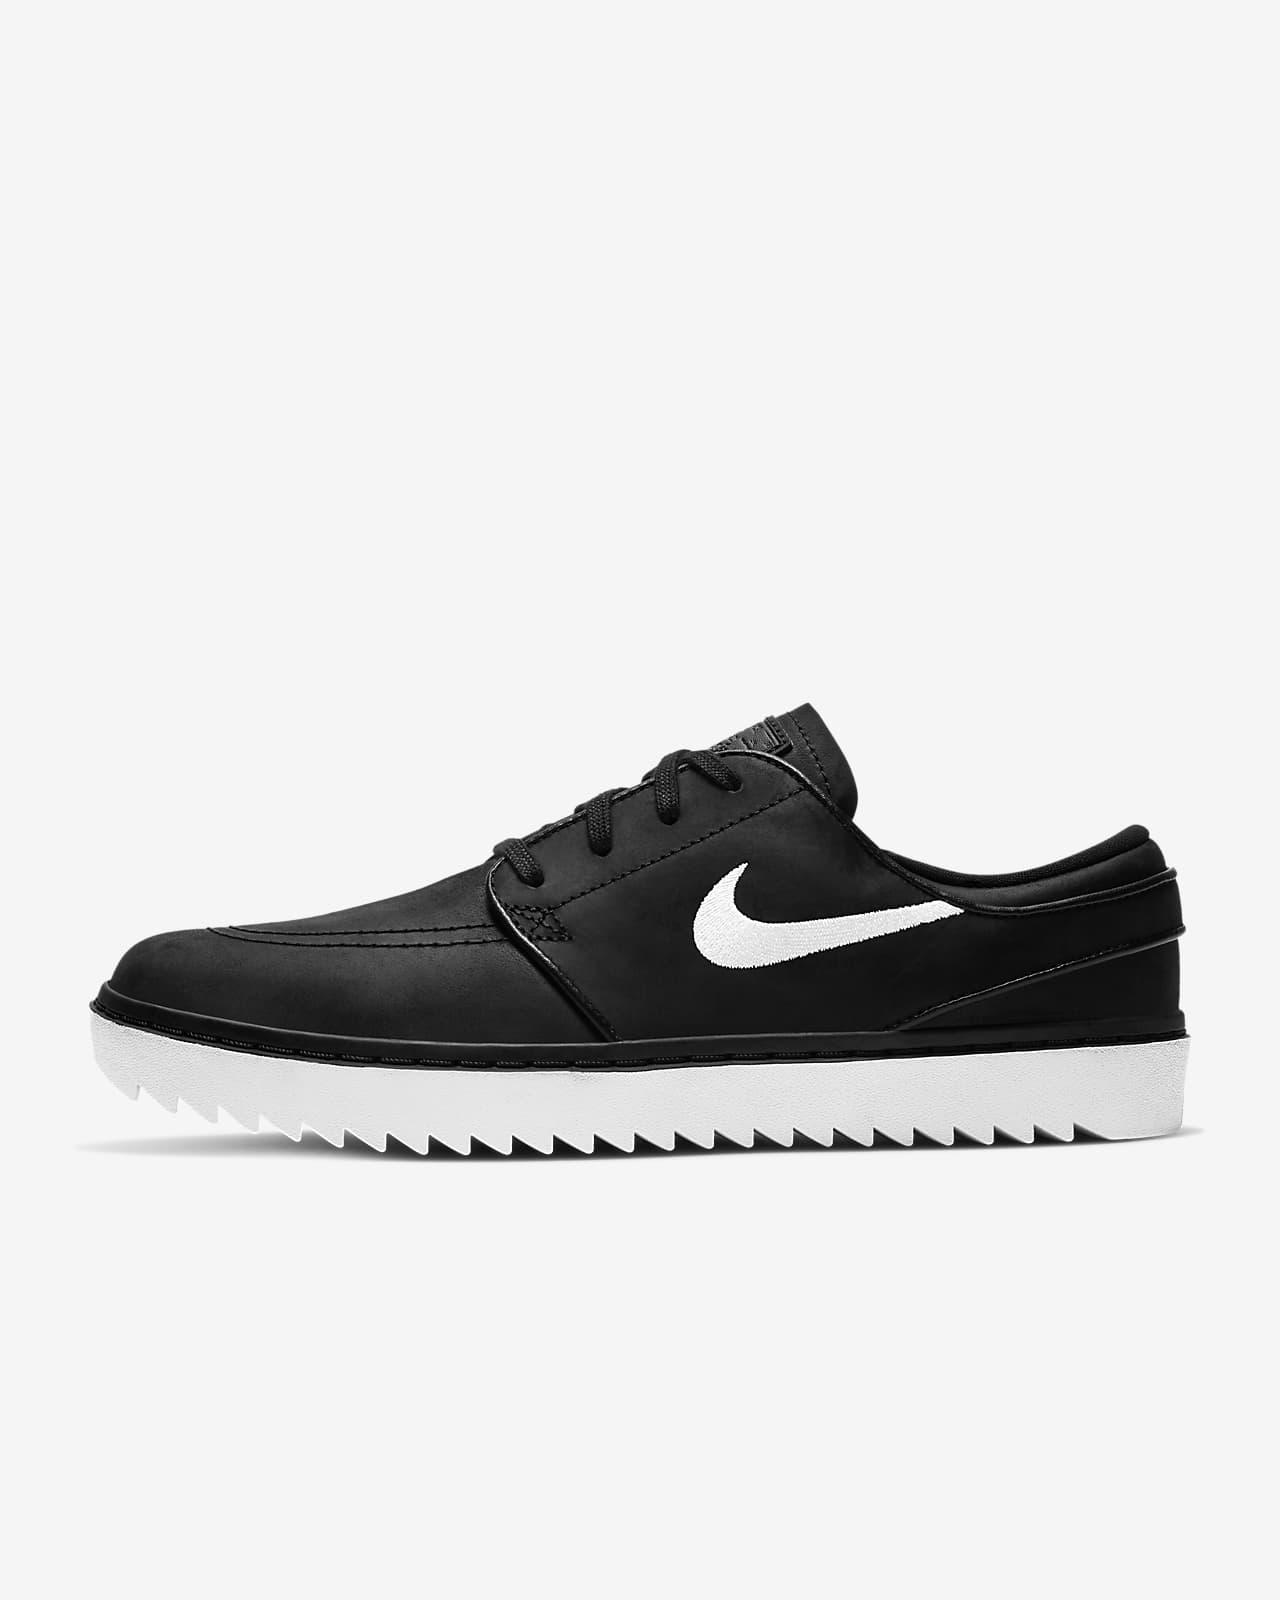 Chaussure de golf Nike Janoski G pour Homme